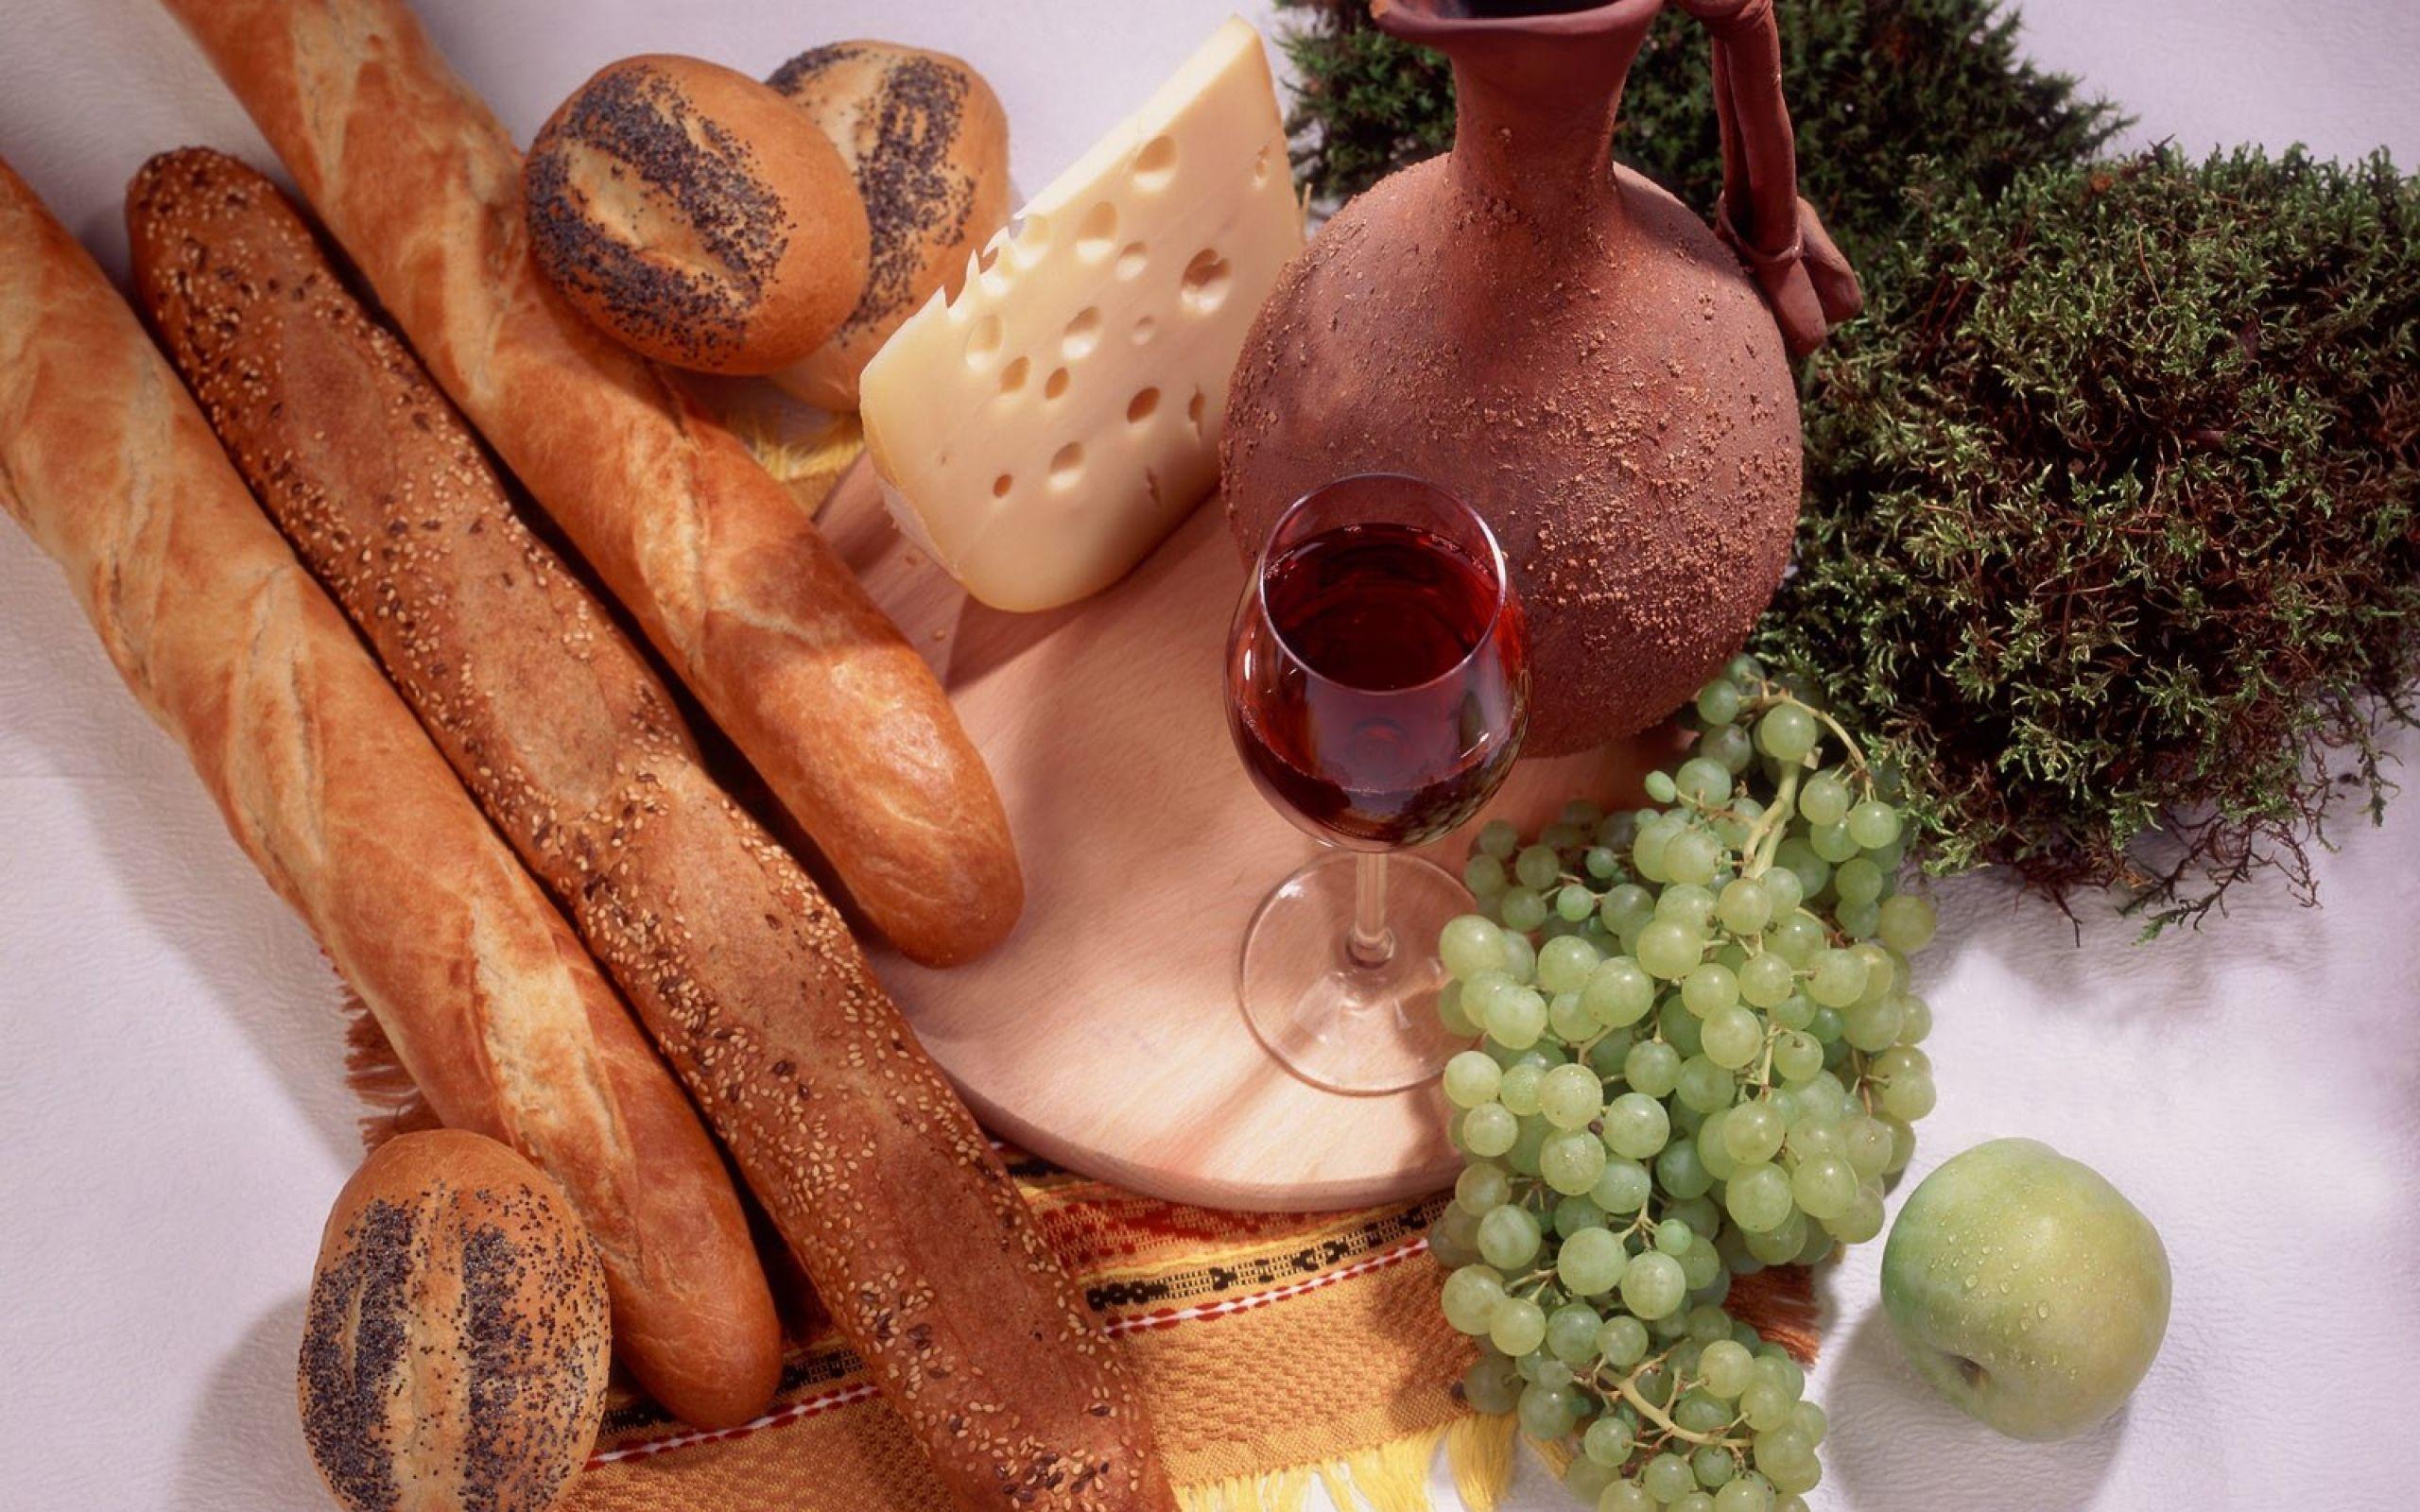 Wines Http Pinterest Com Ramiromacias Wines Bread Cheese Bakery Bread